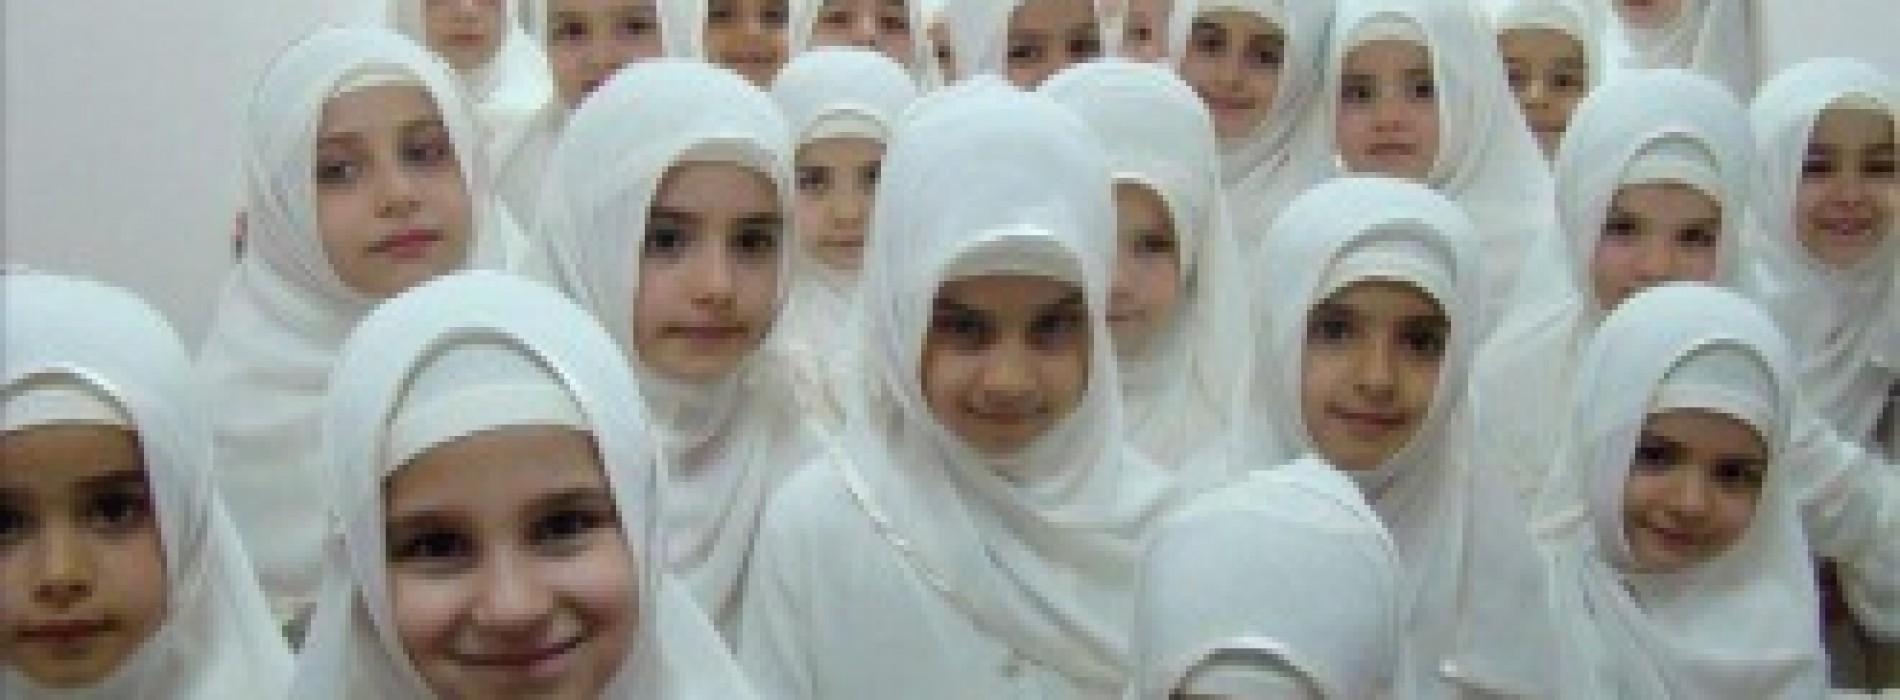 Instilling Modesty in Children